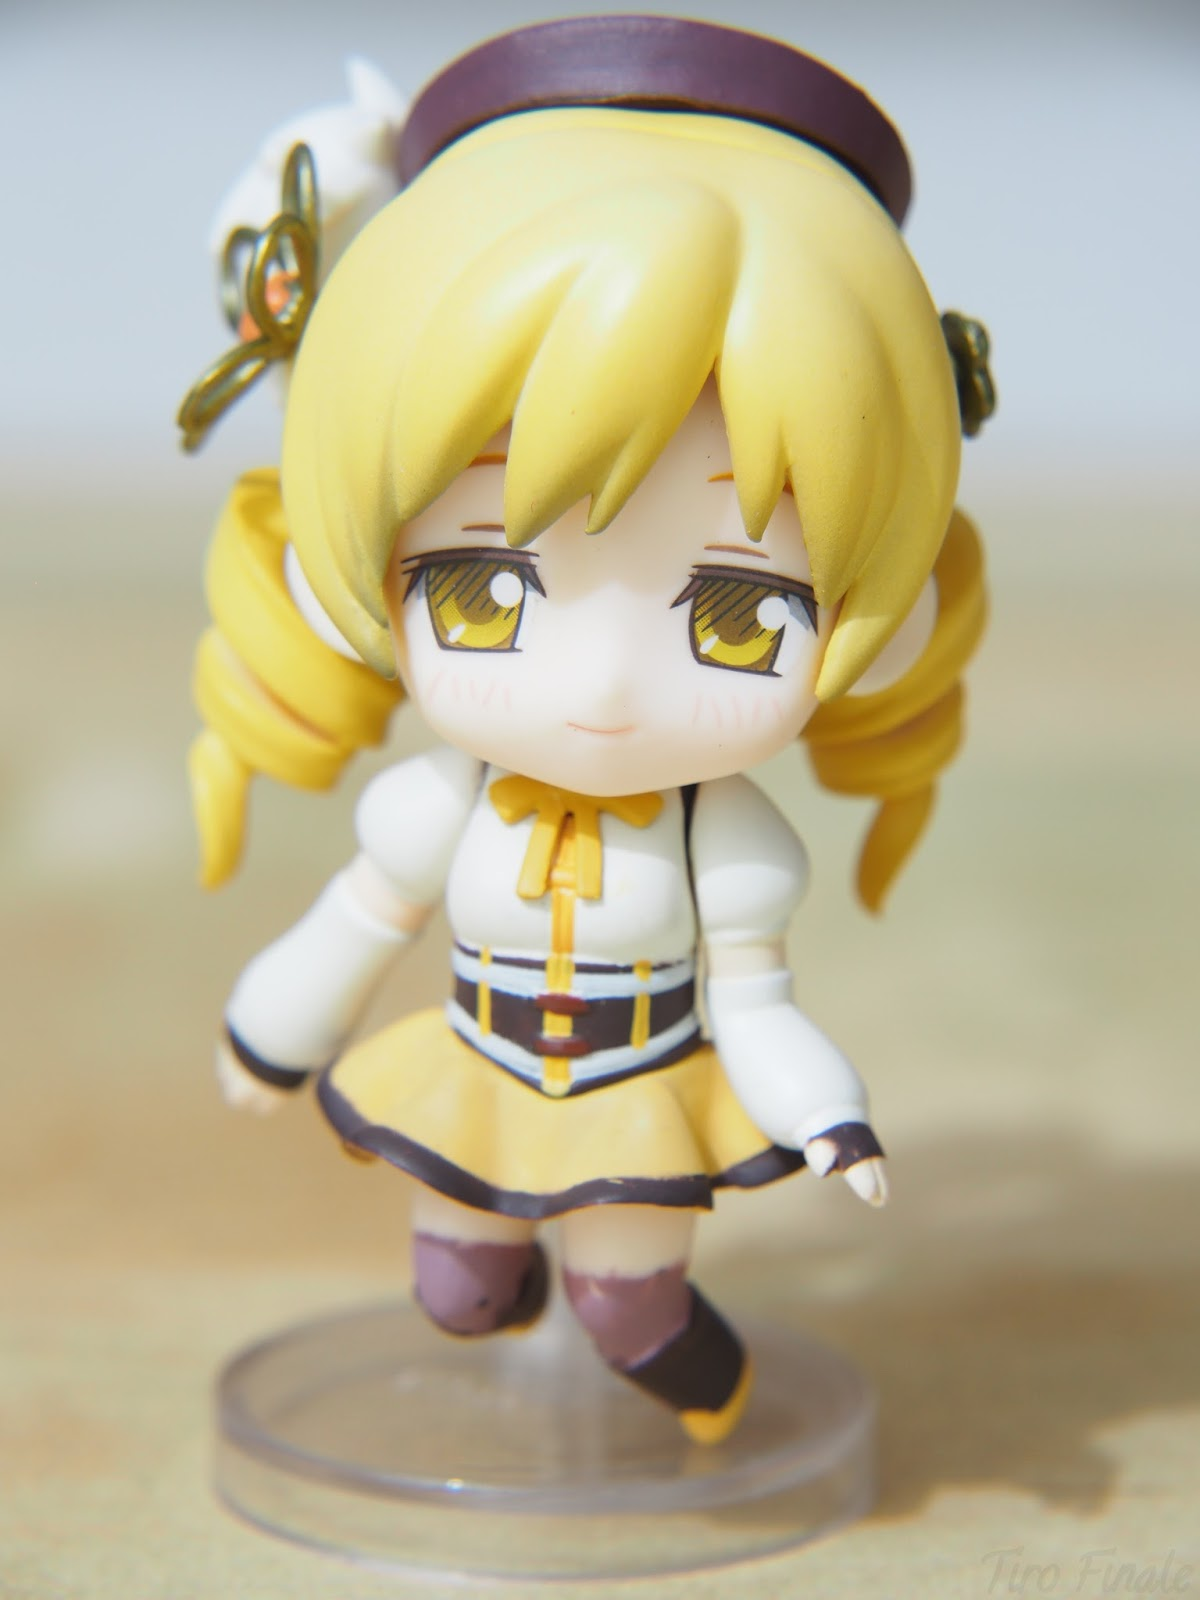 GoodSmile Nendoroid Petit Puella Magi Madoka Magica Figure Kyoko Sakura Uniform